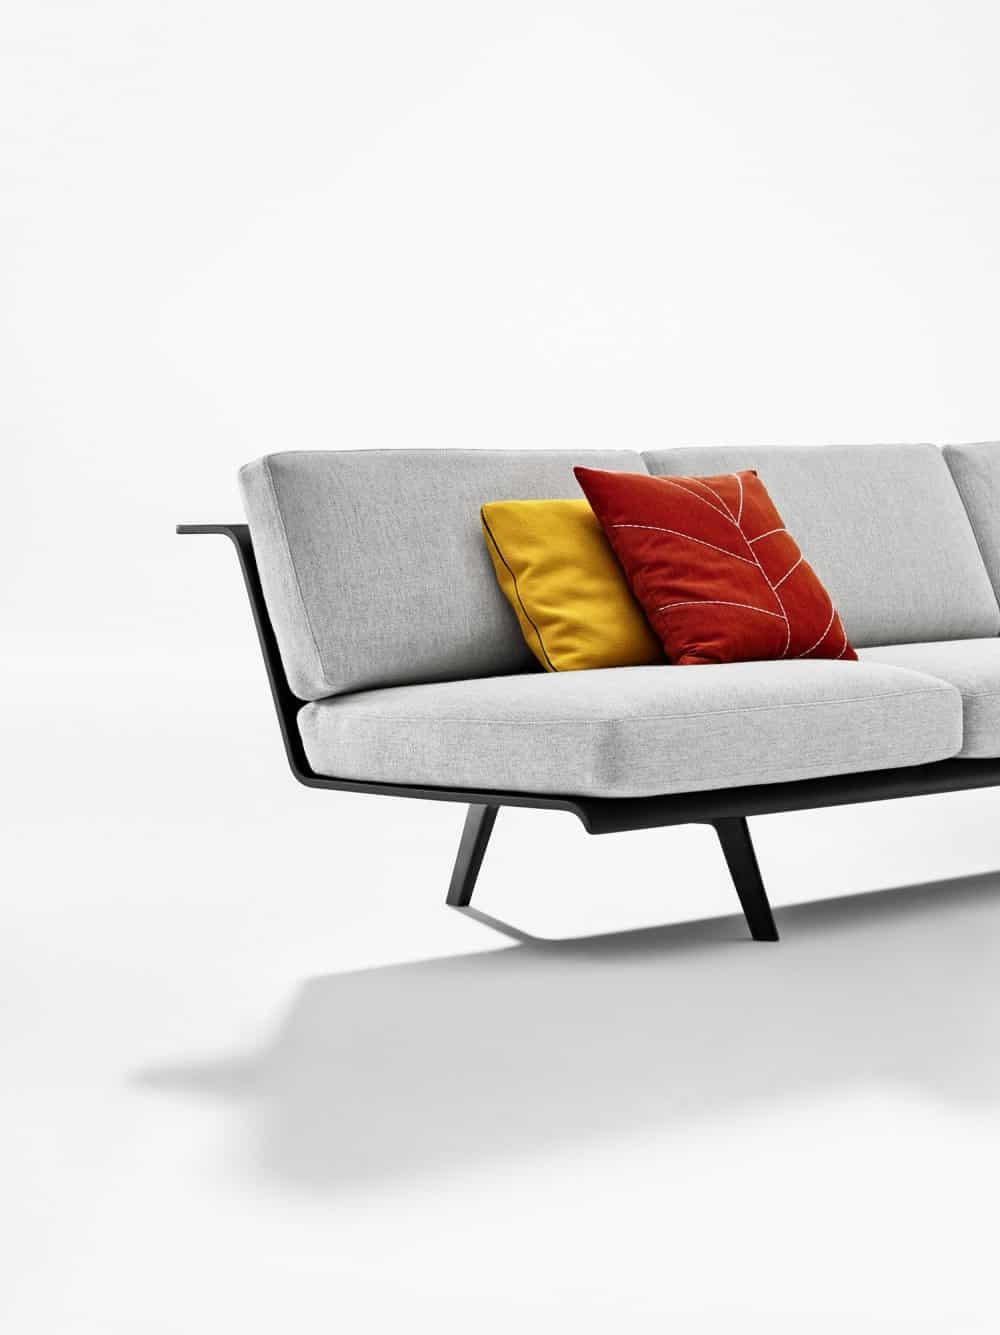 Versatile Modular Sofa System Zinta from Arper